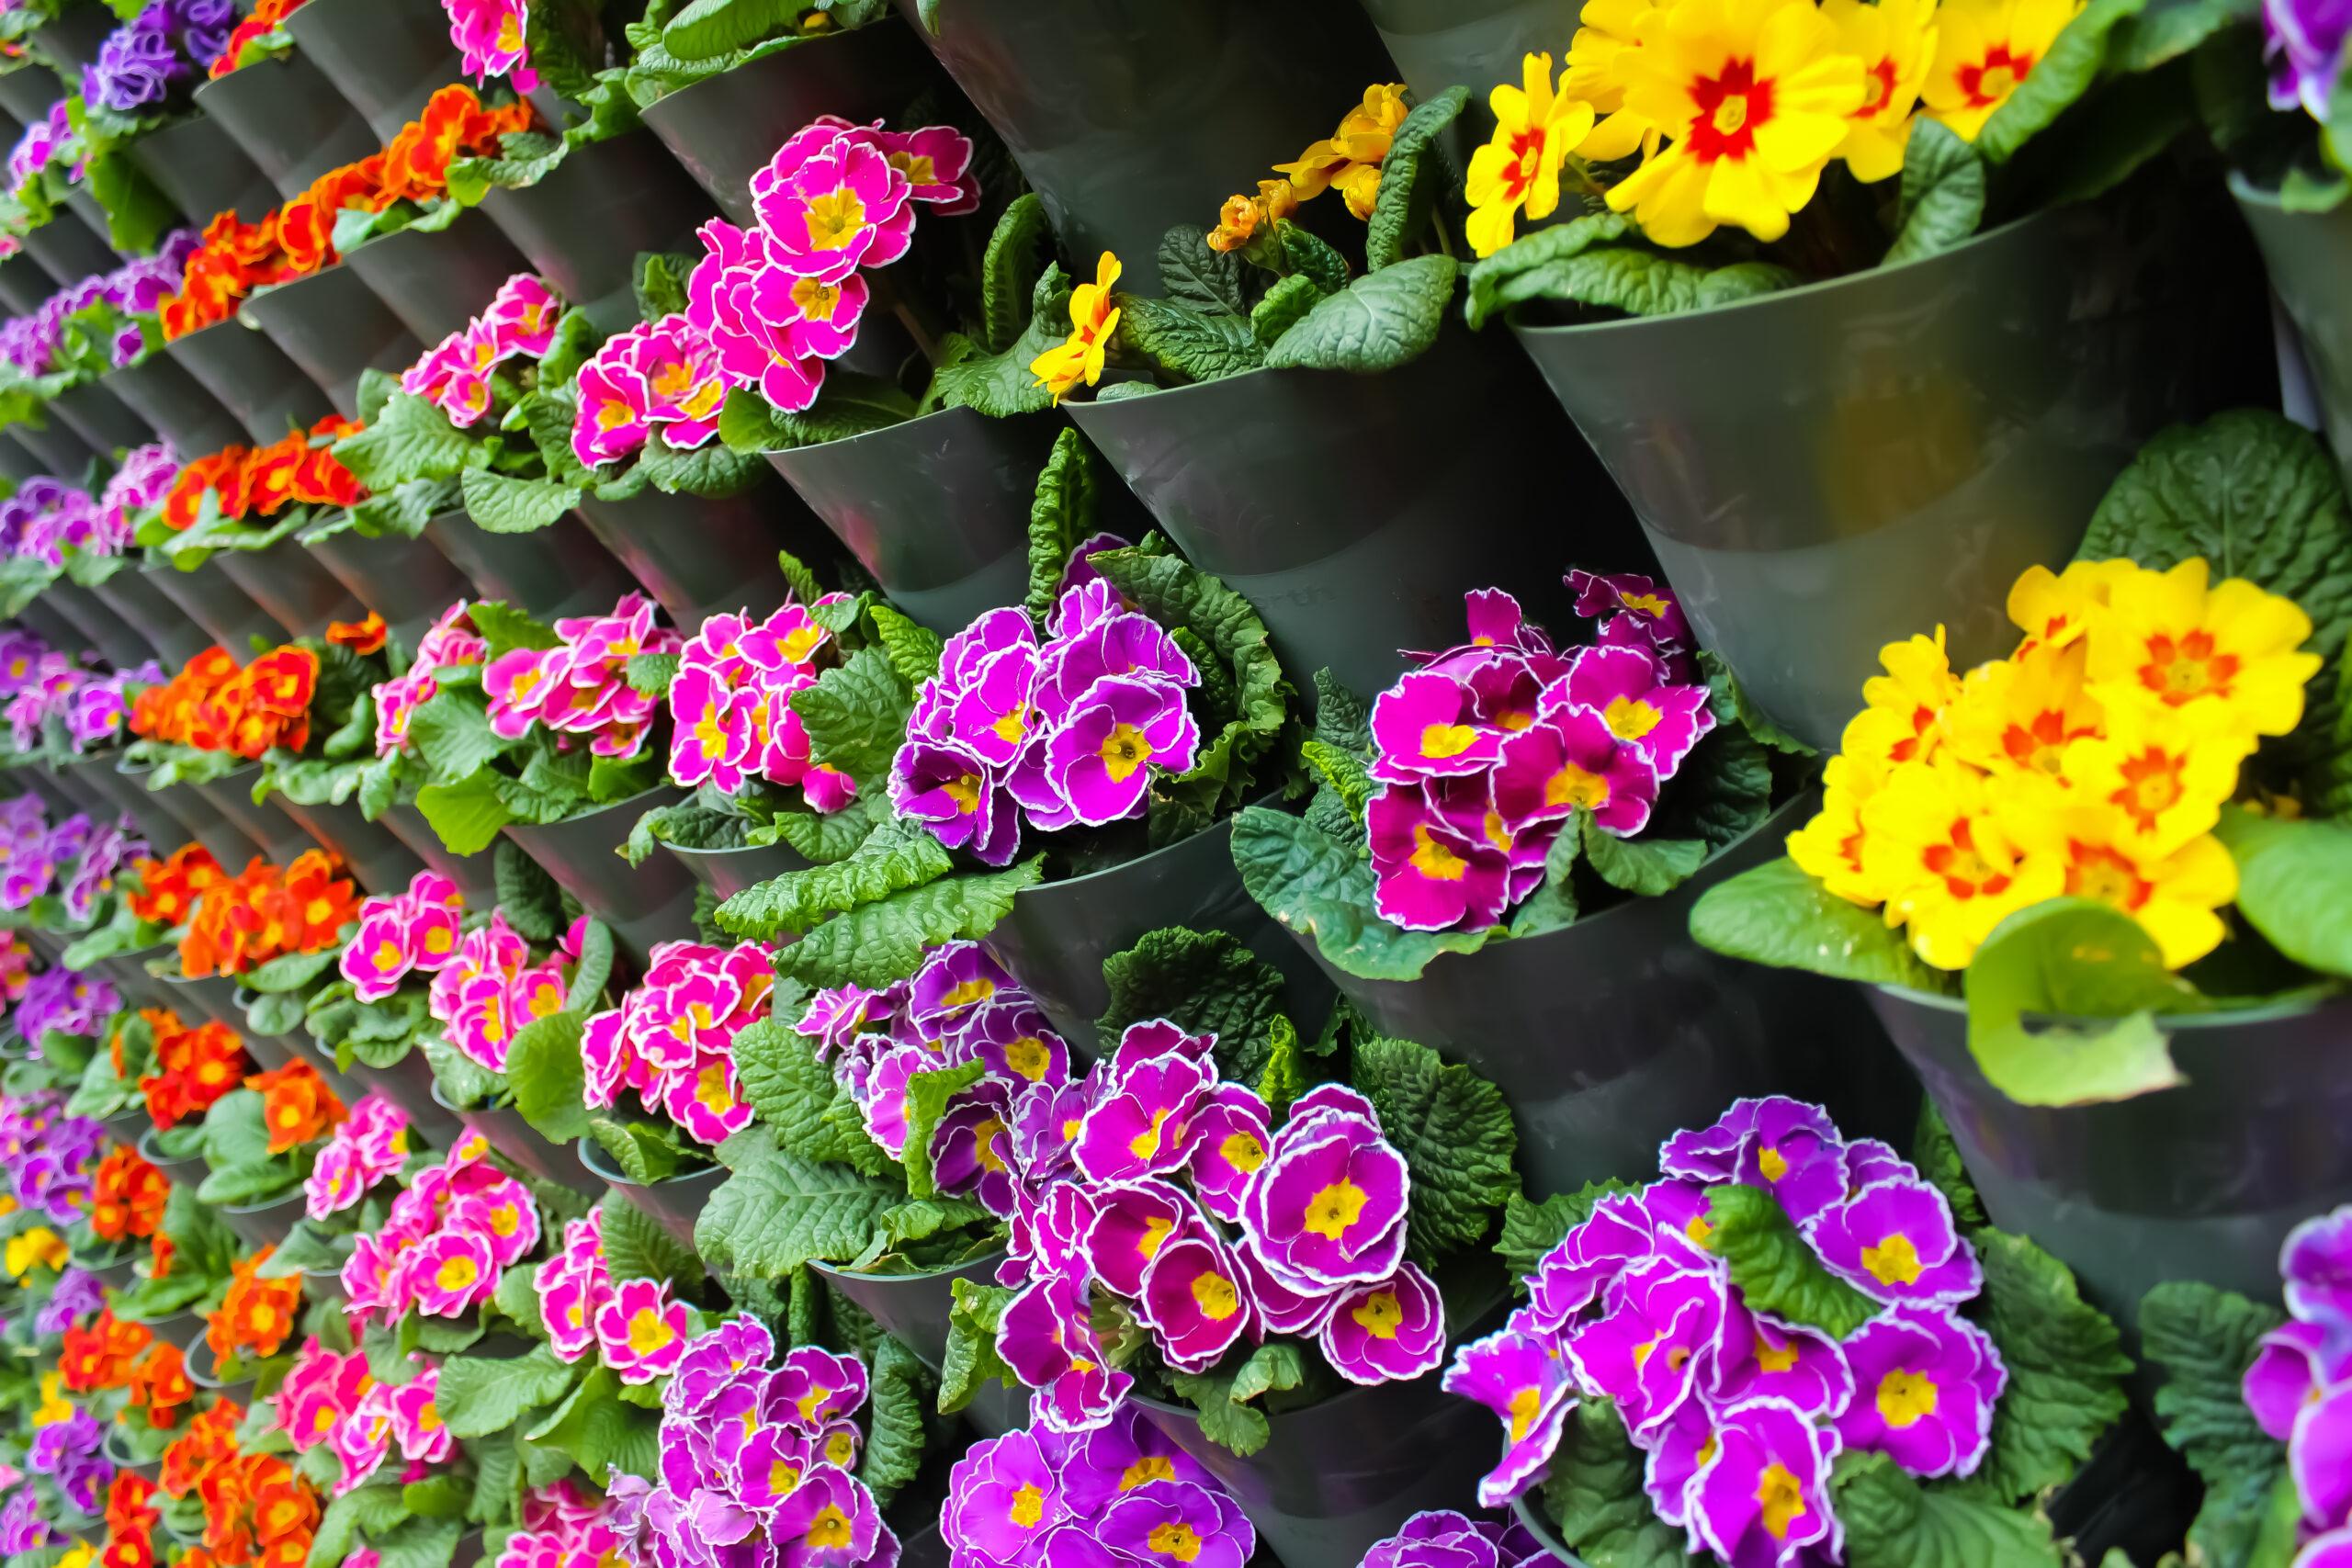 Colourful fresh flowers